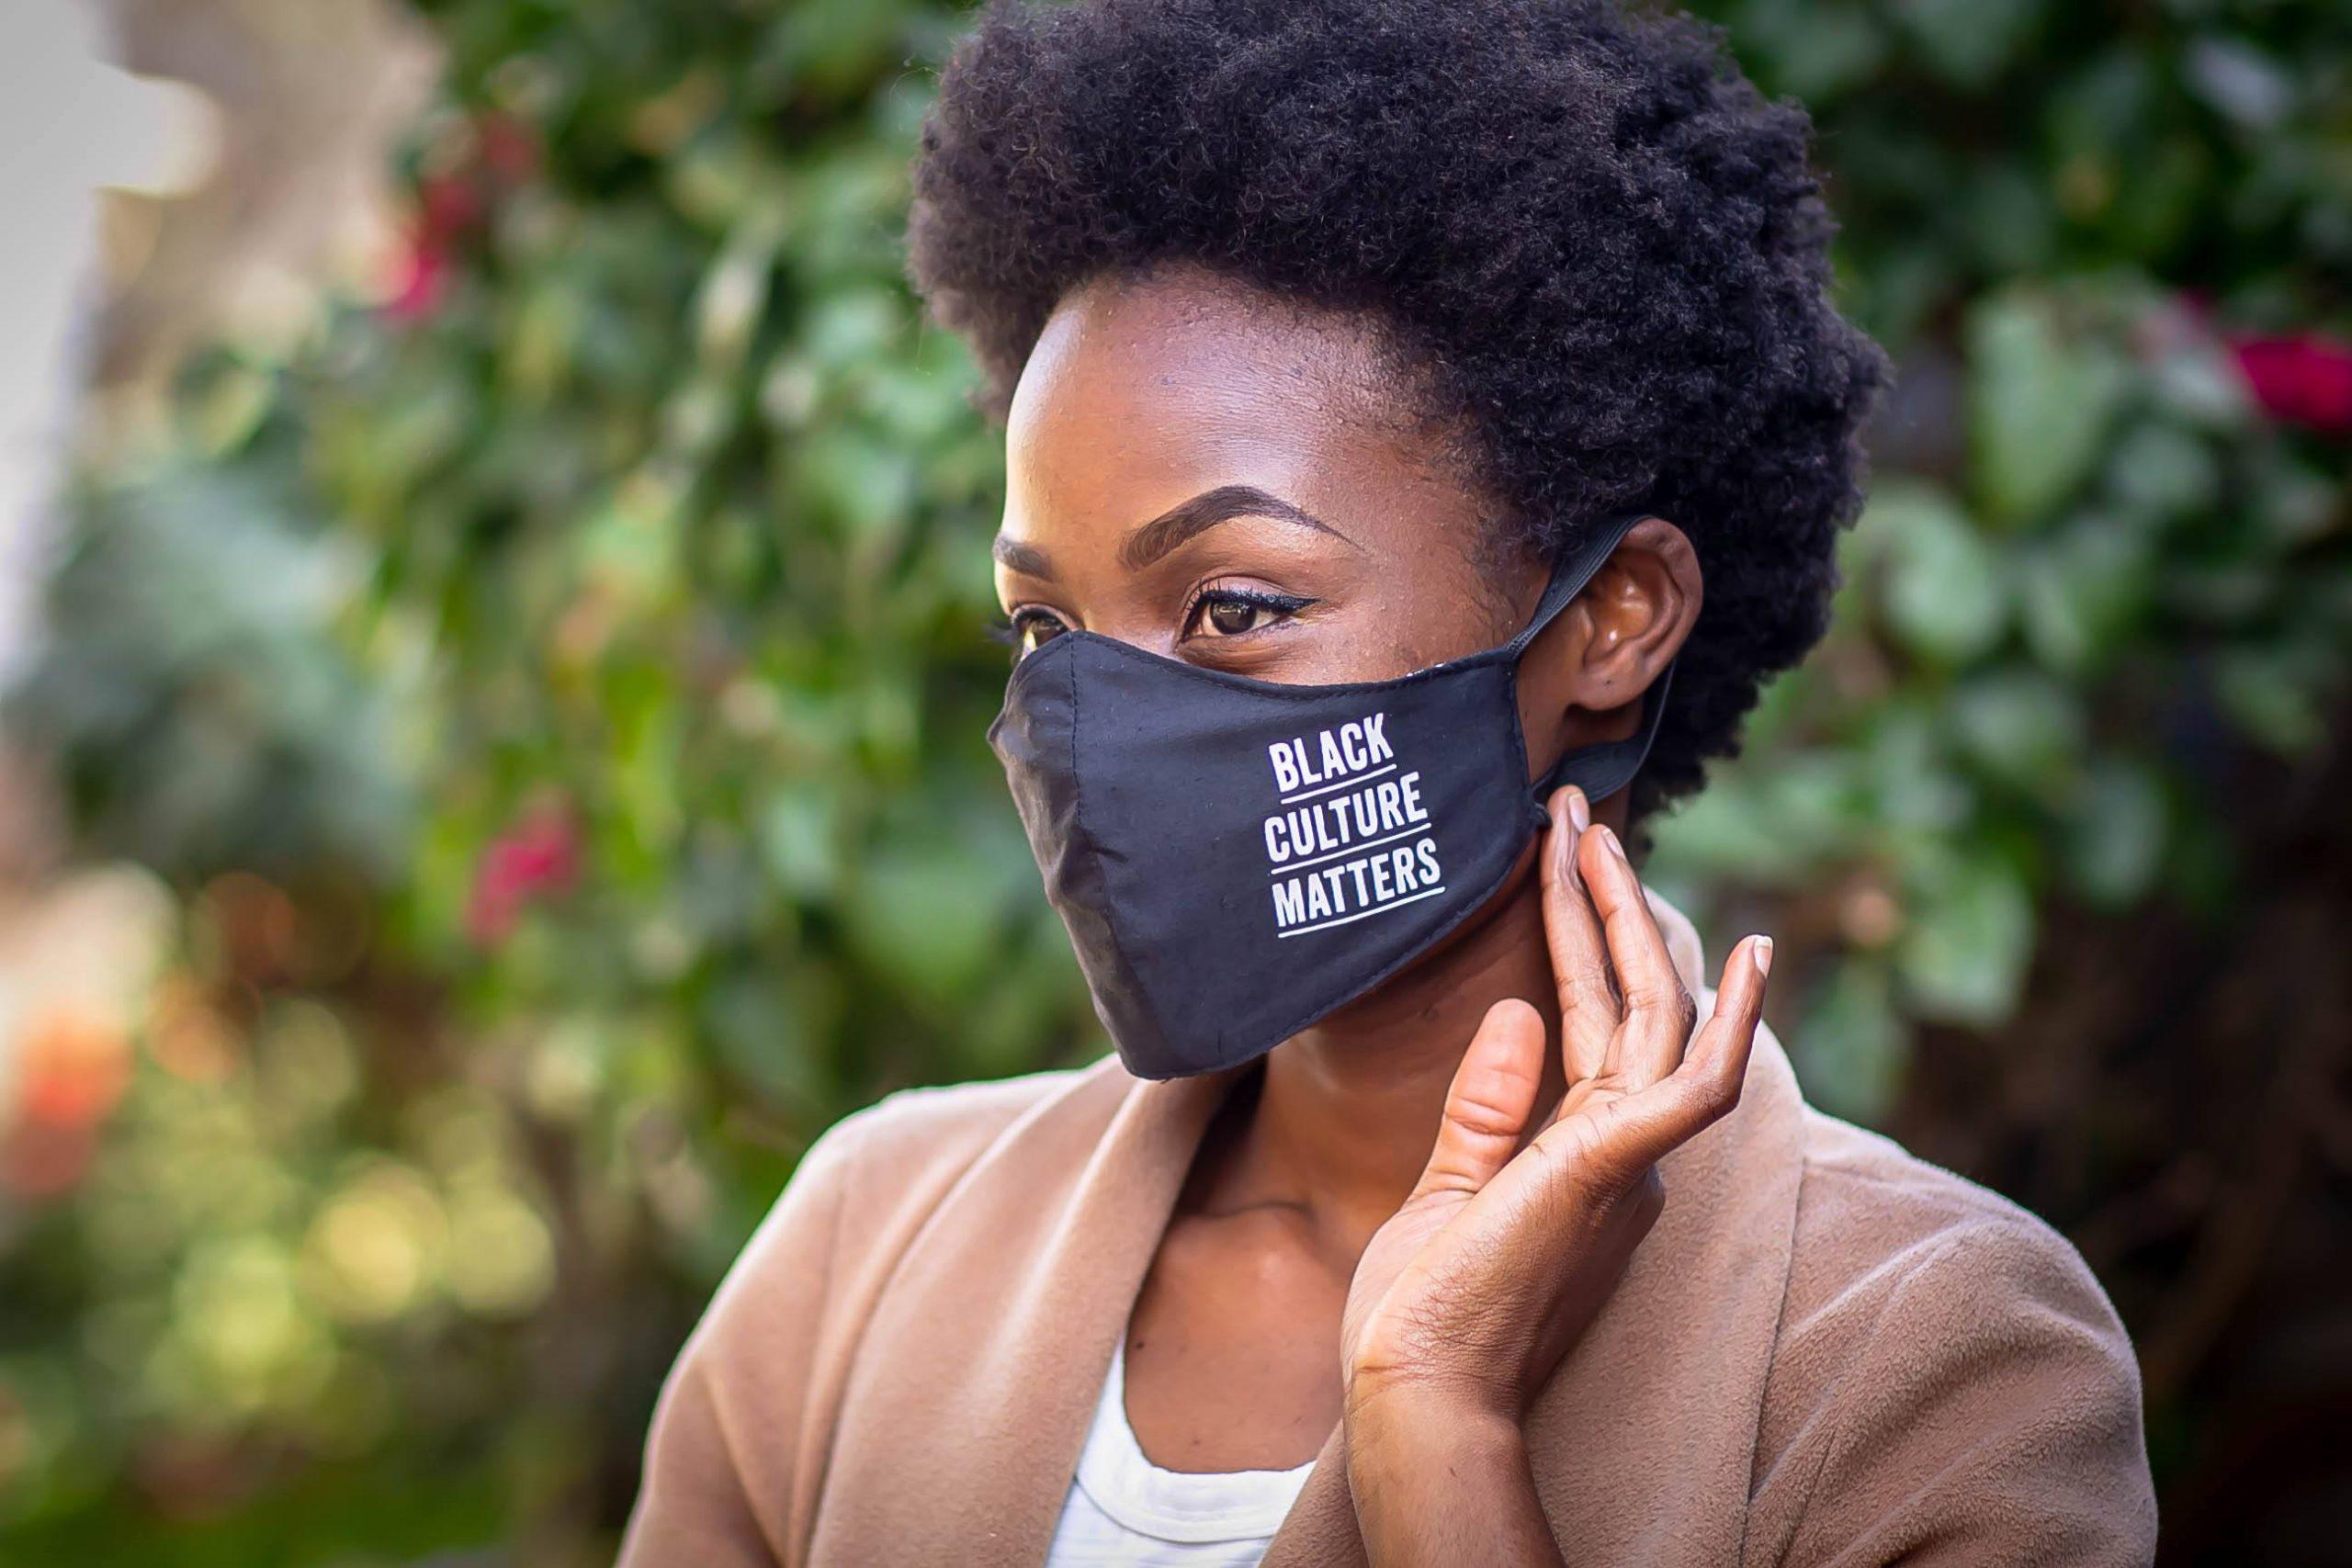 Reusable Designer Face Mask - Black Culture Matters